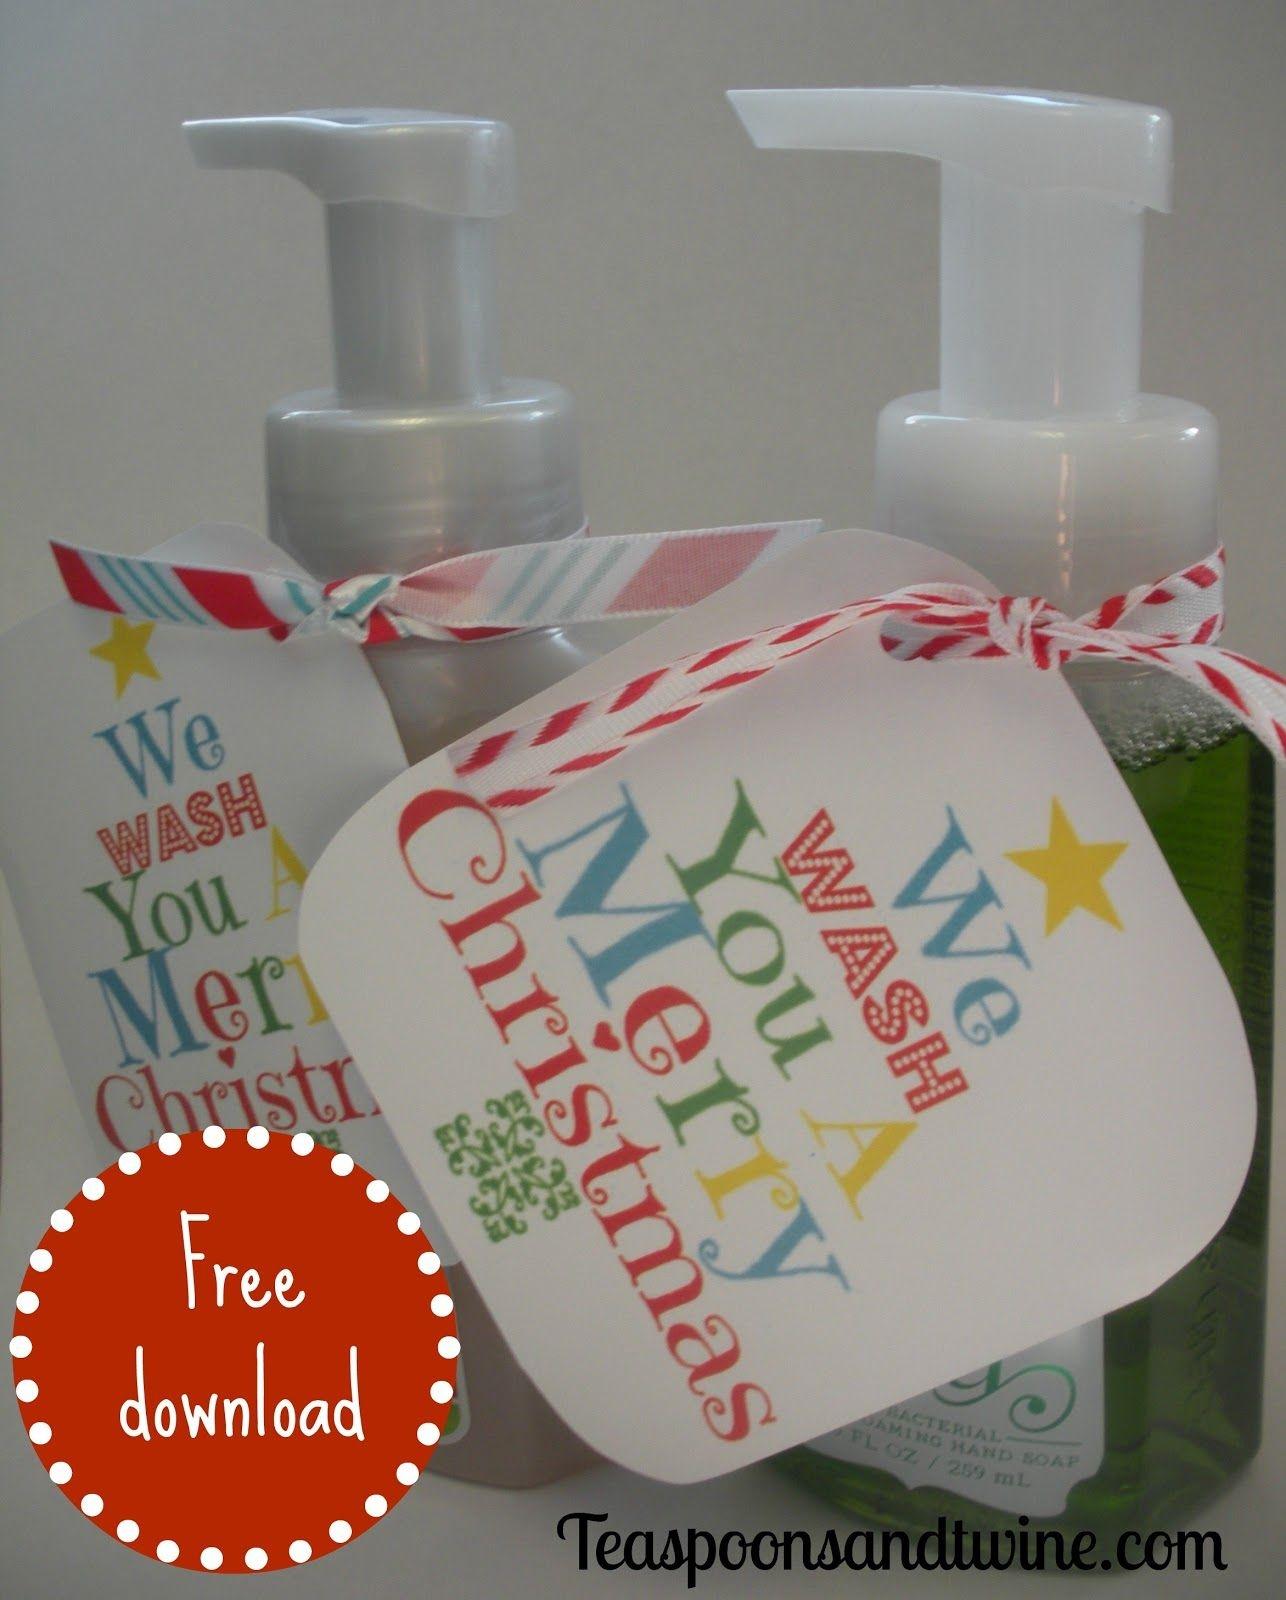 Teaspoons & Twine: We Wash You A Merry Christmas | Crafty, Crafty - We Wash You A Merry Christmas Free Printable